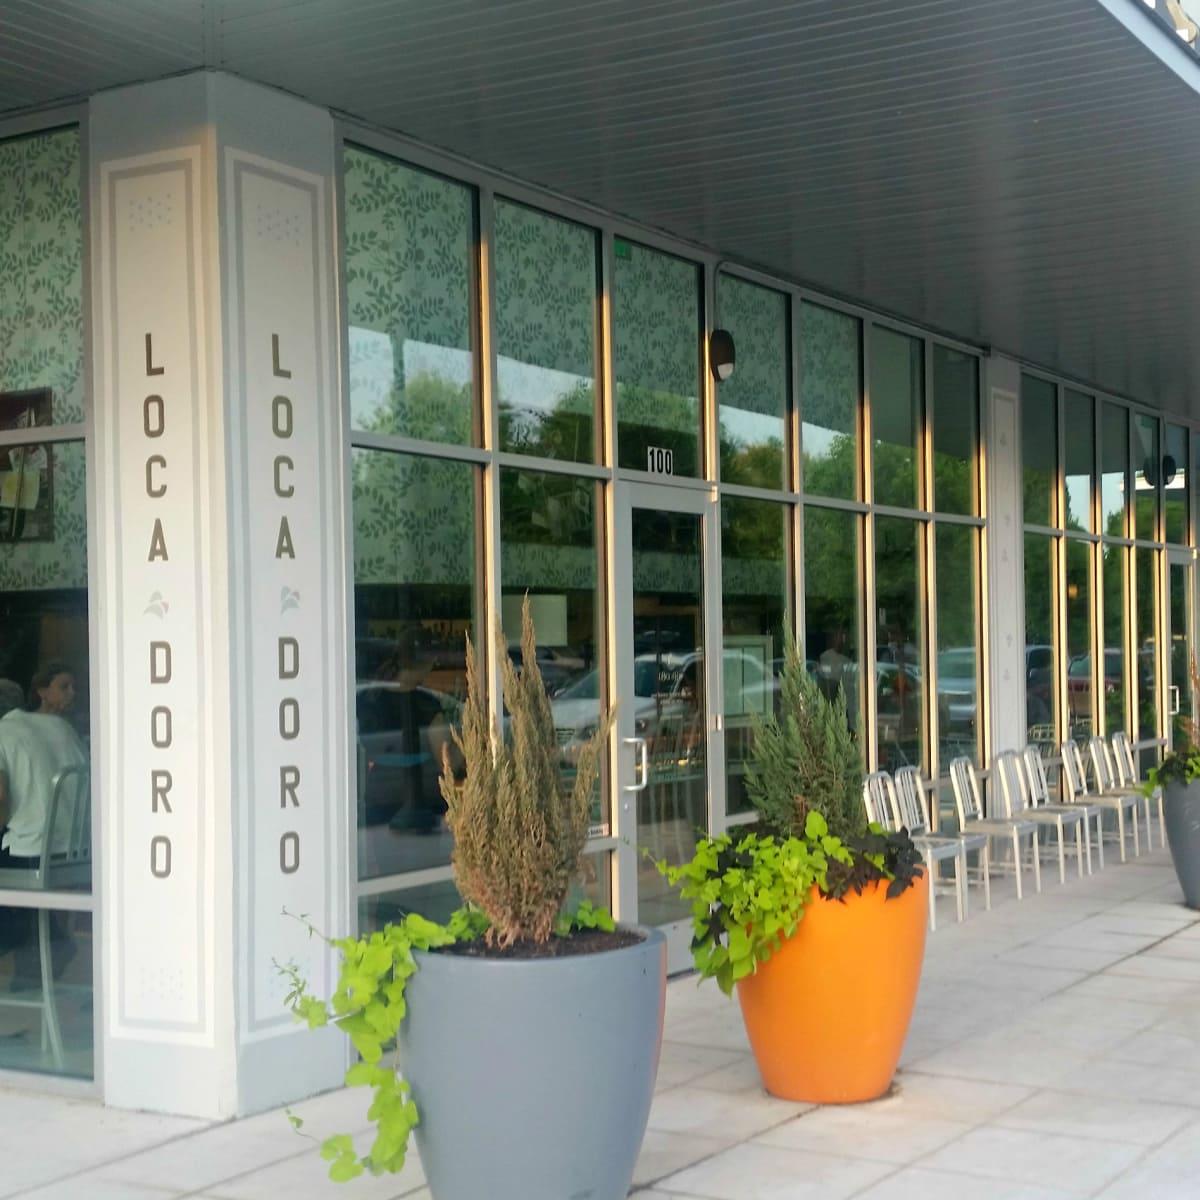 L'Oca D'Oro Austin restaurant Italian exterior front